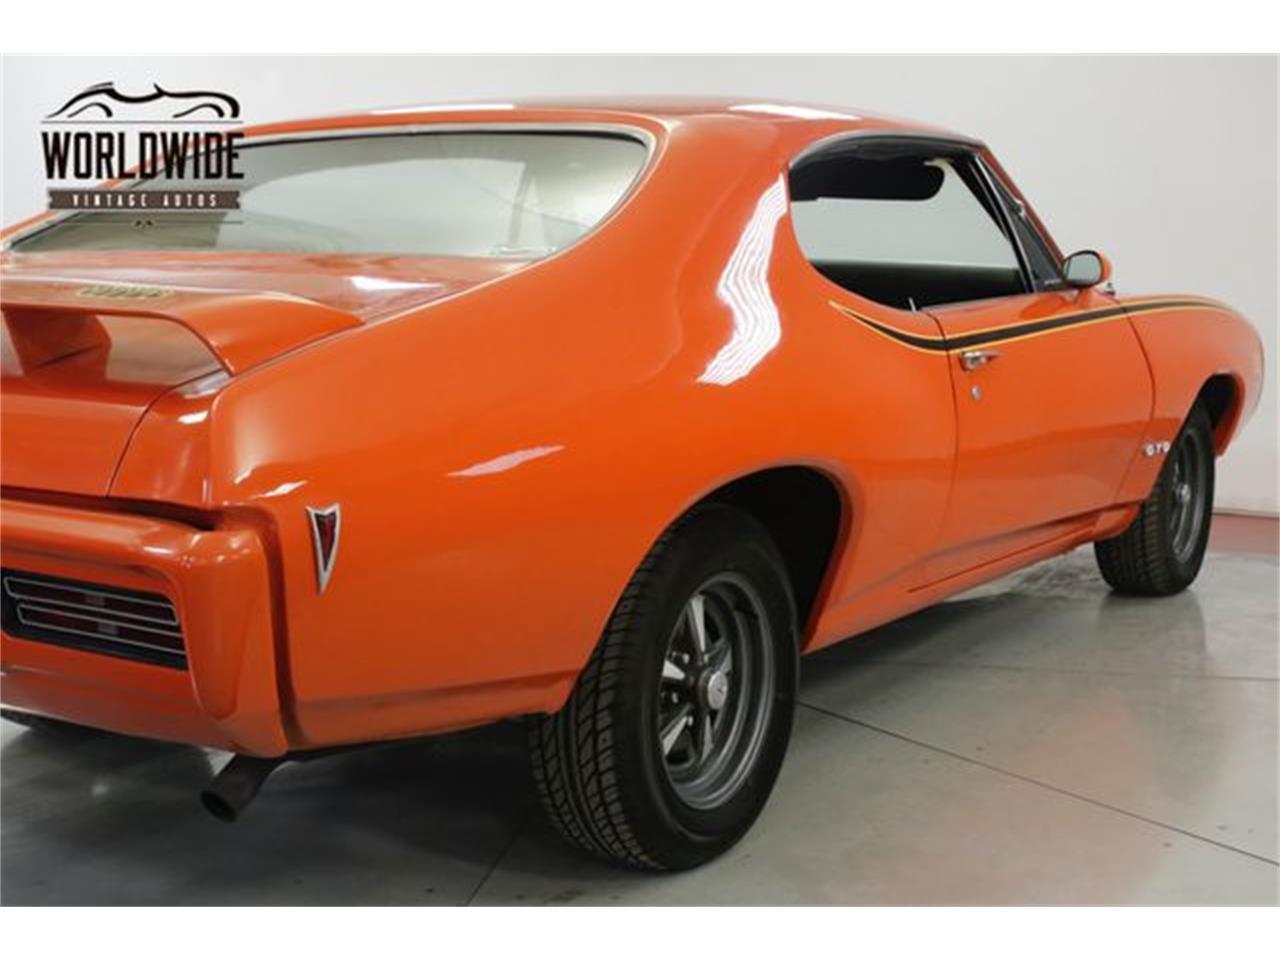 Large Picture of Classic '68 Pontiac GTO located in Colorado - $20,900.00 - QHH8